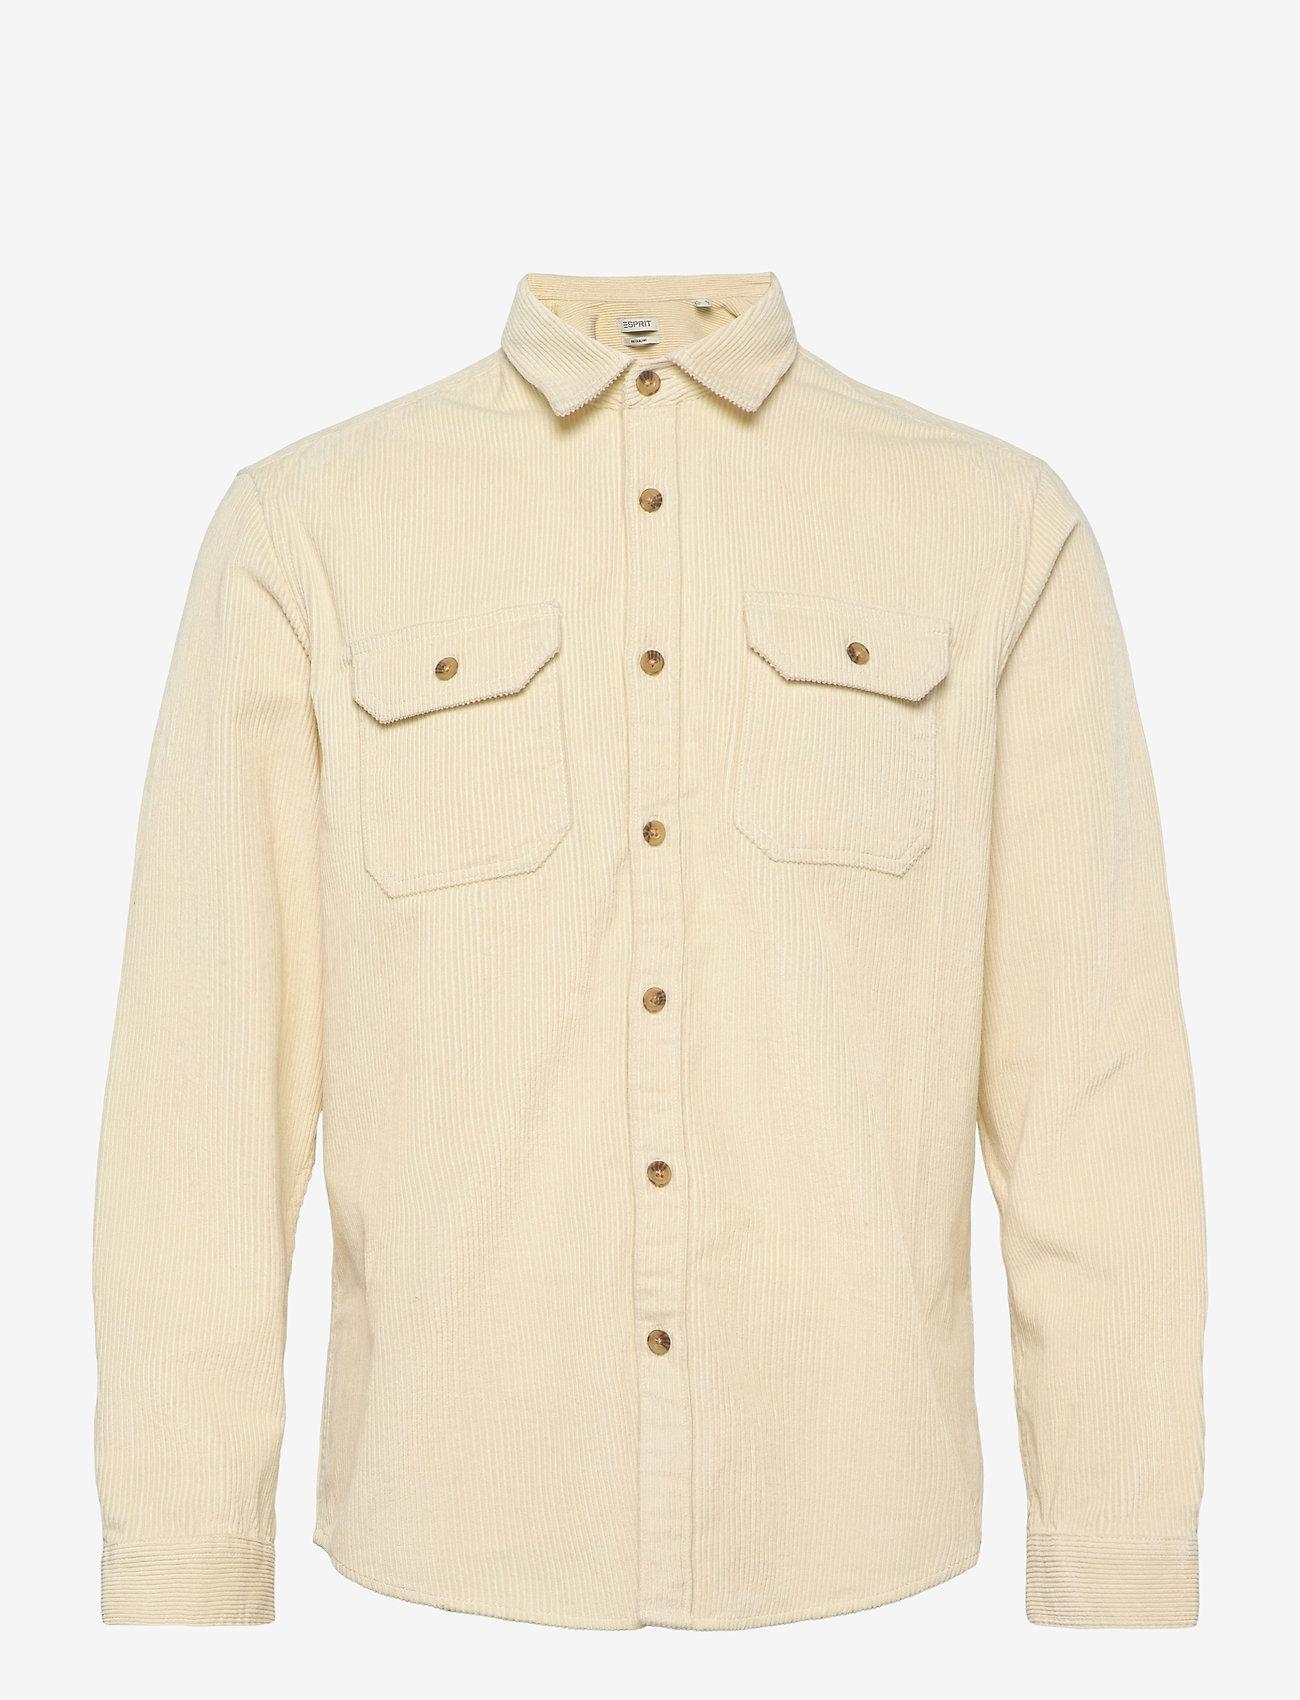 Esprit Casual - Shirts woven - hauts - cream beige - 0